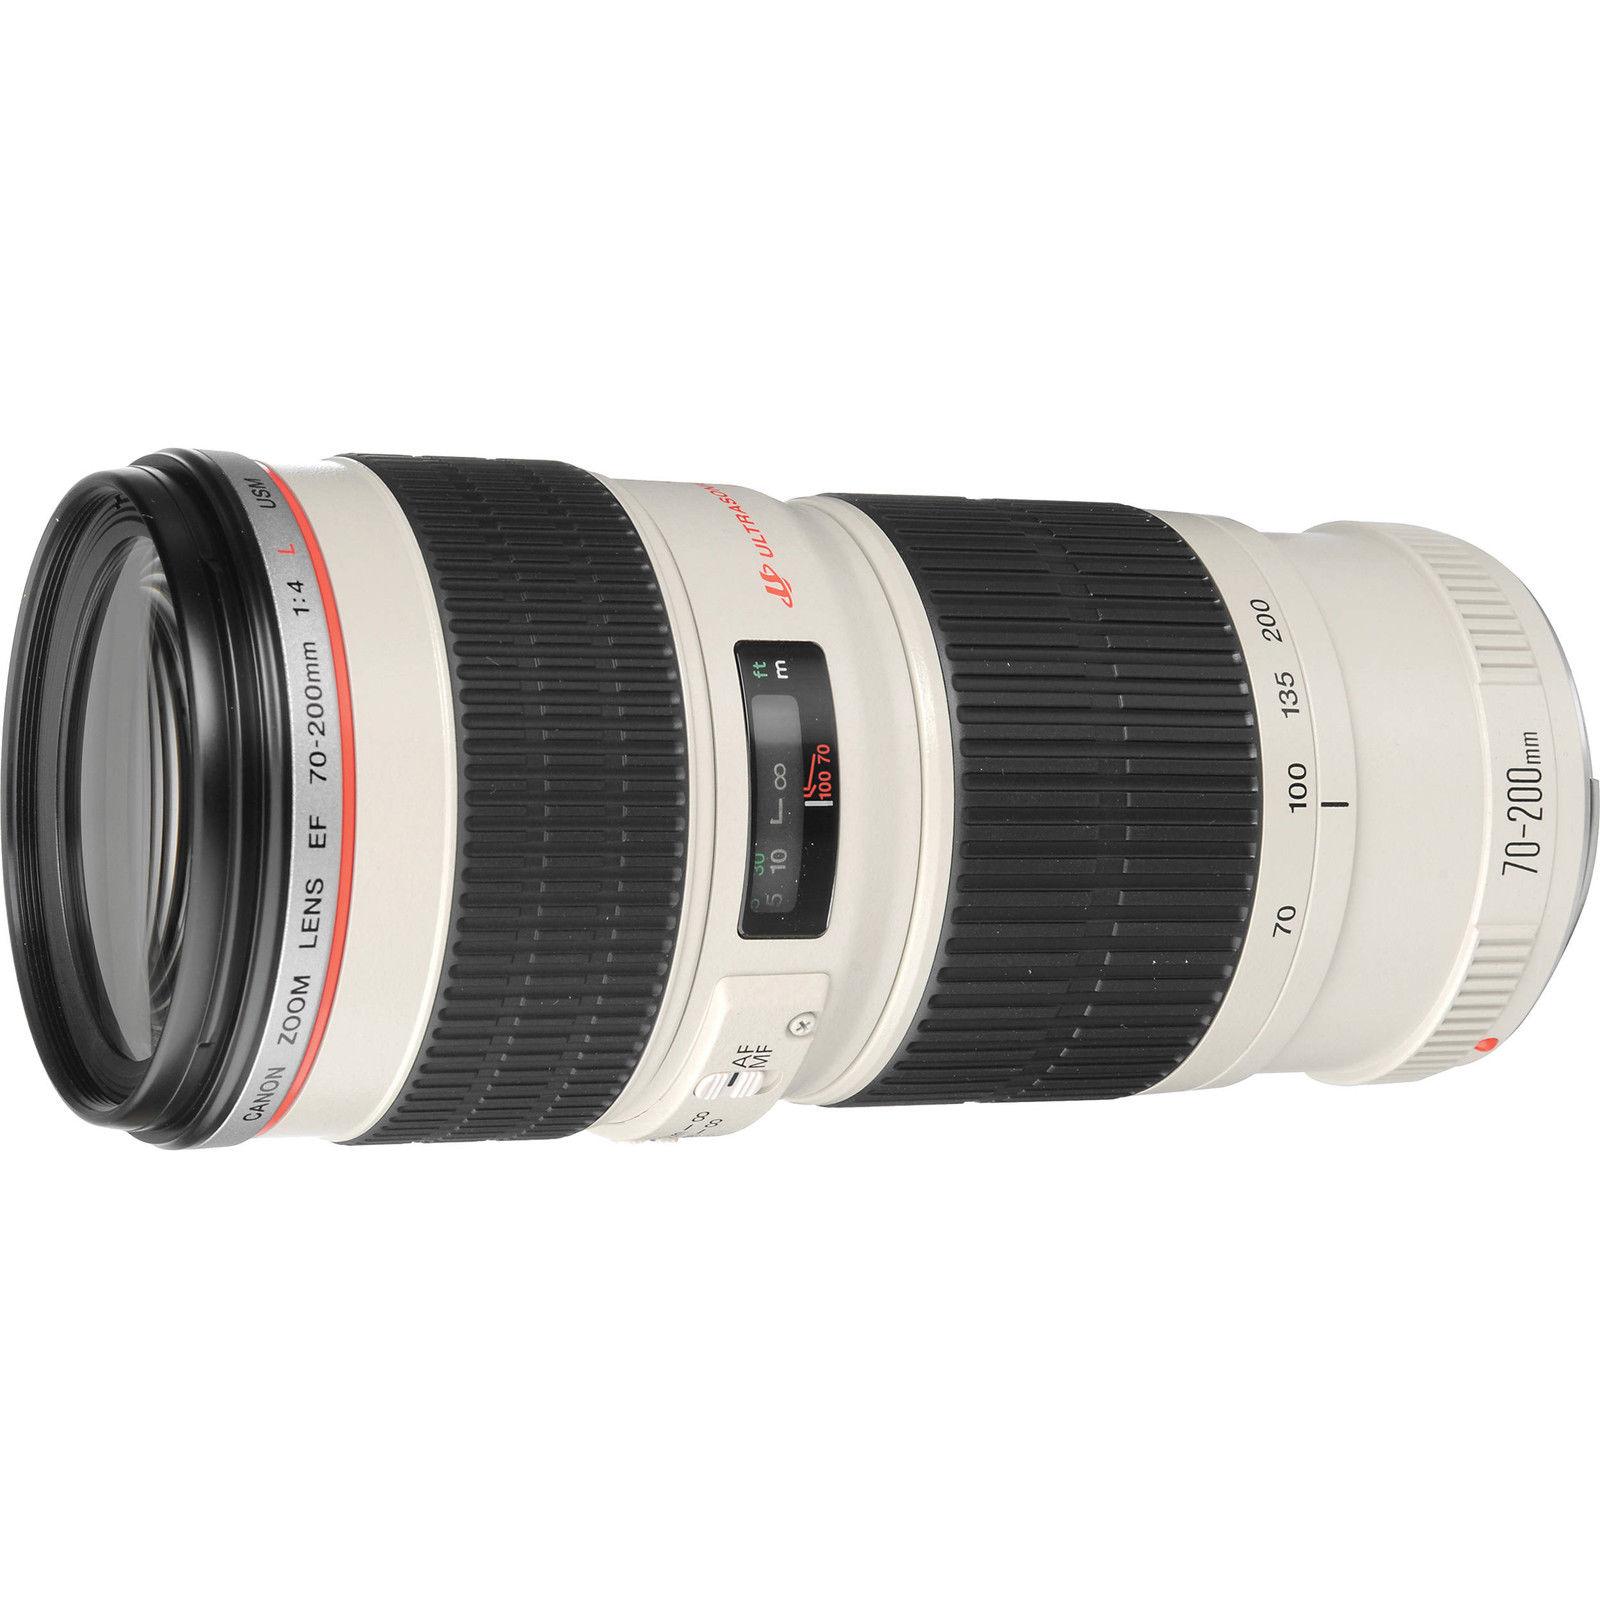 Canon EF 70-200mm f/4L USM